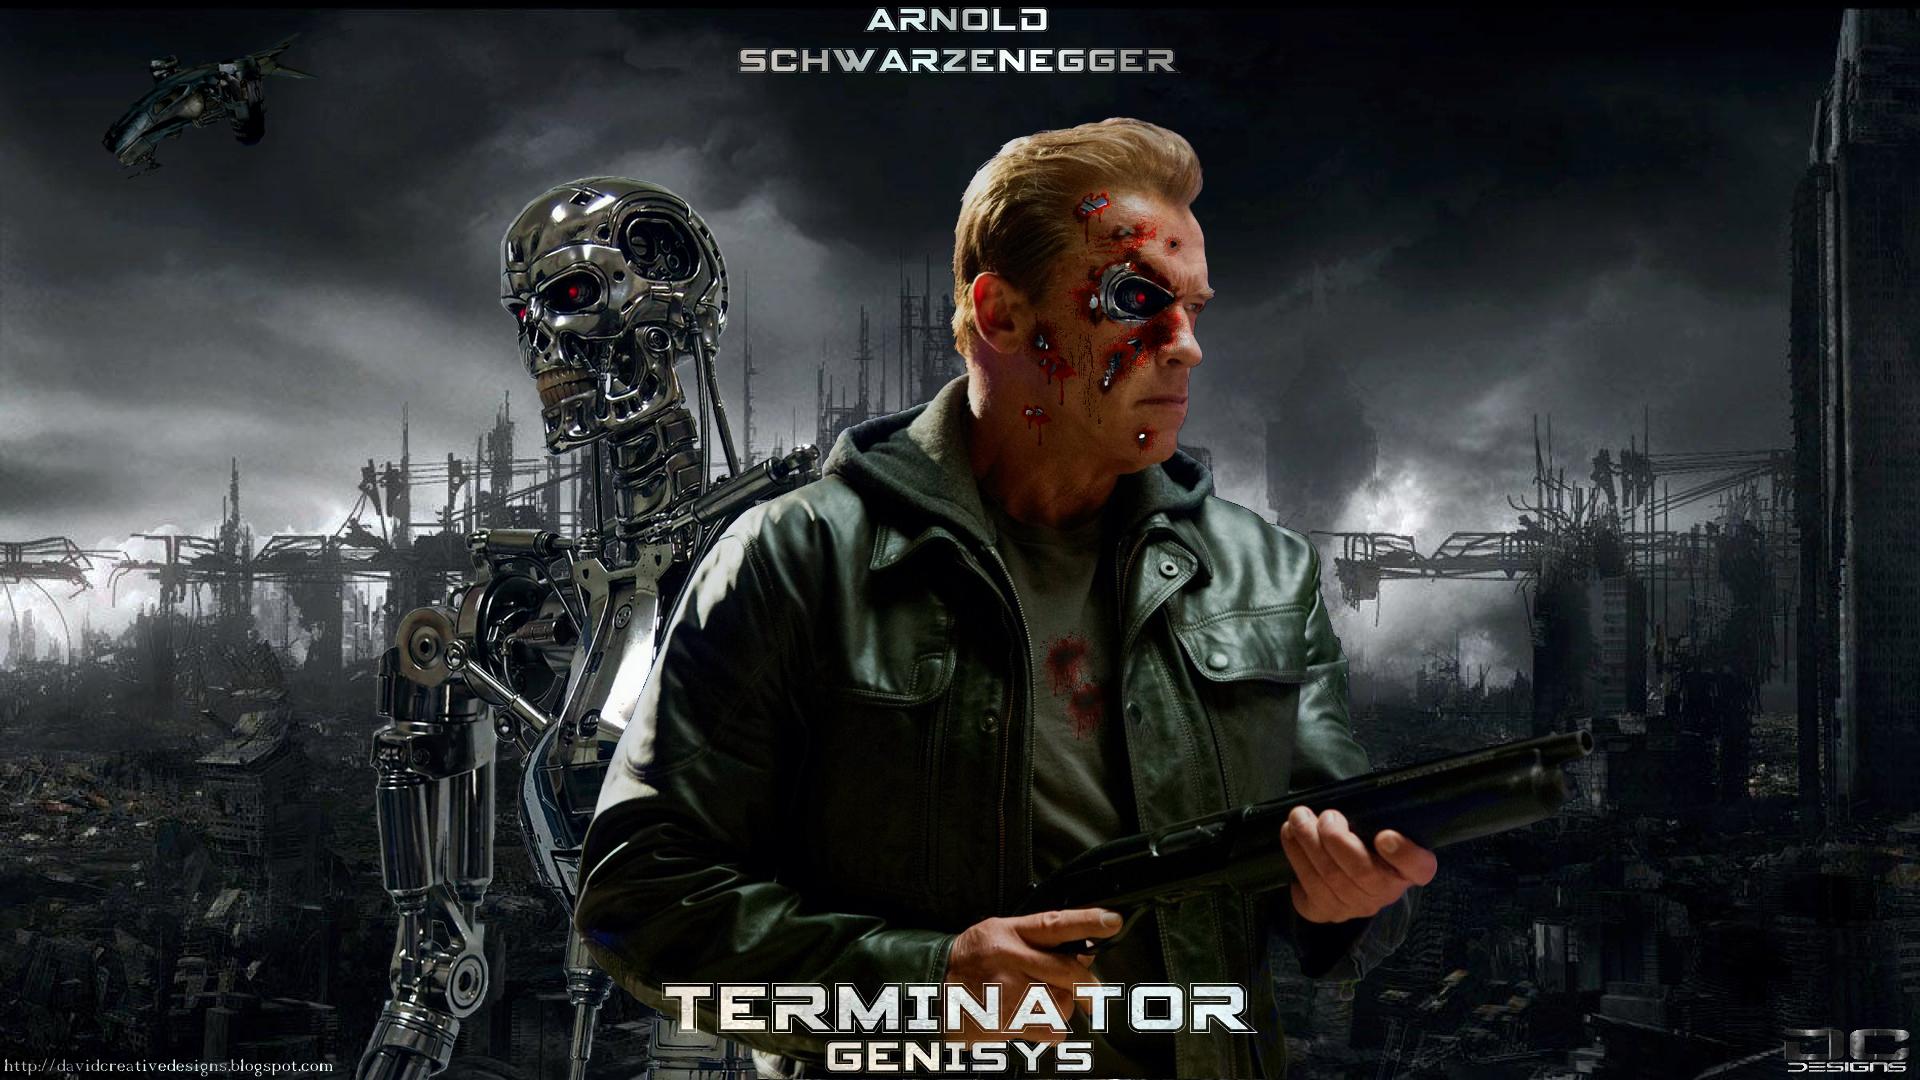 Terminator Genisys HD Wallpaper Background Image 1920x1080 1920x1080